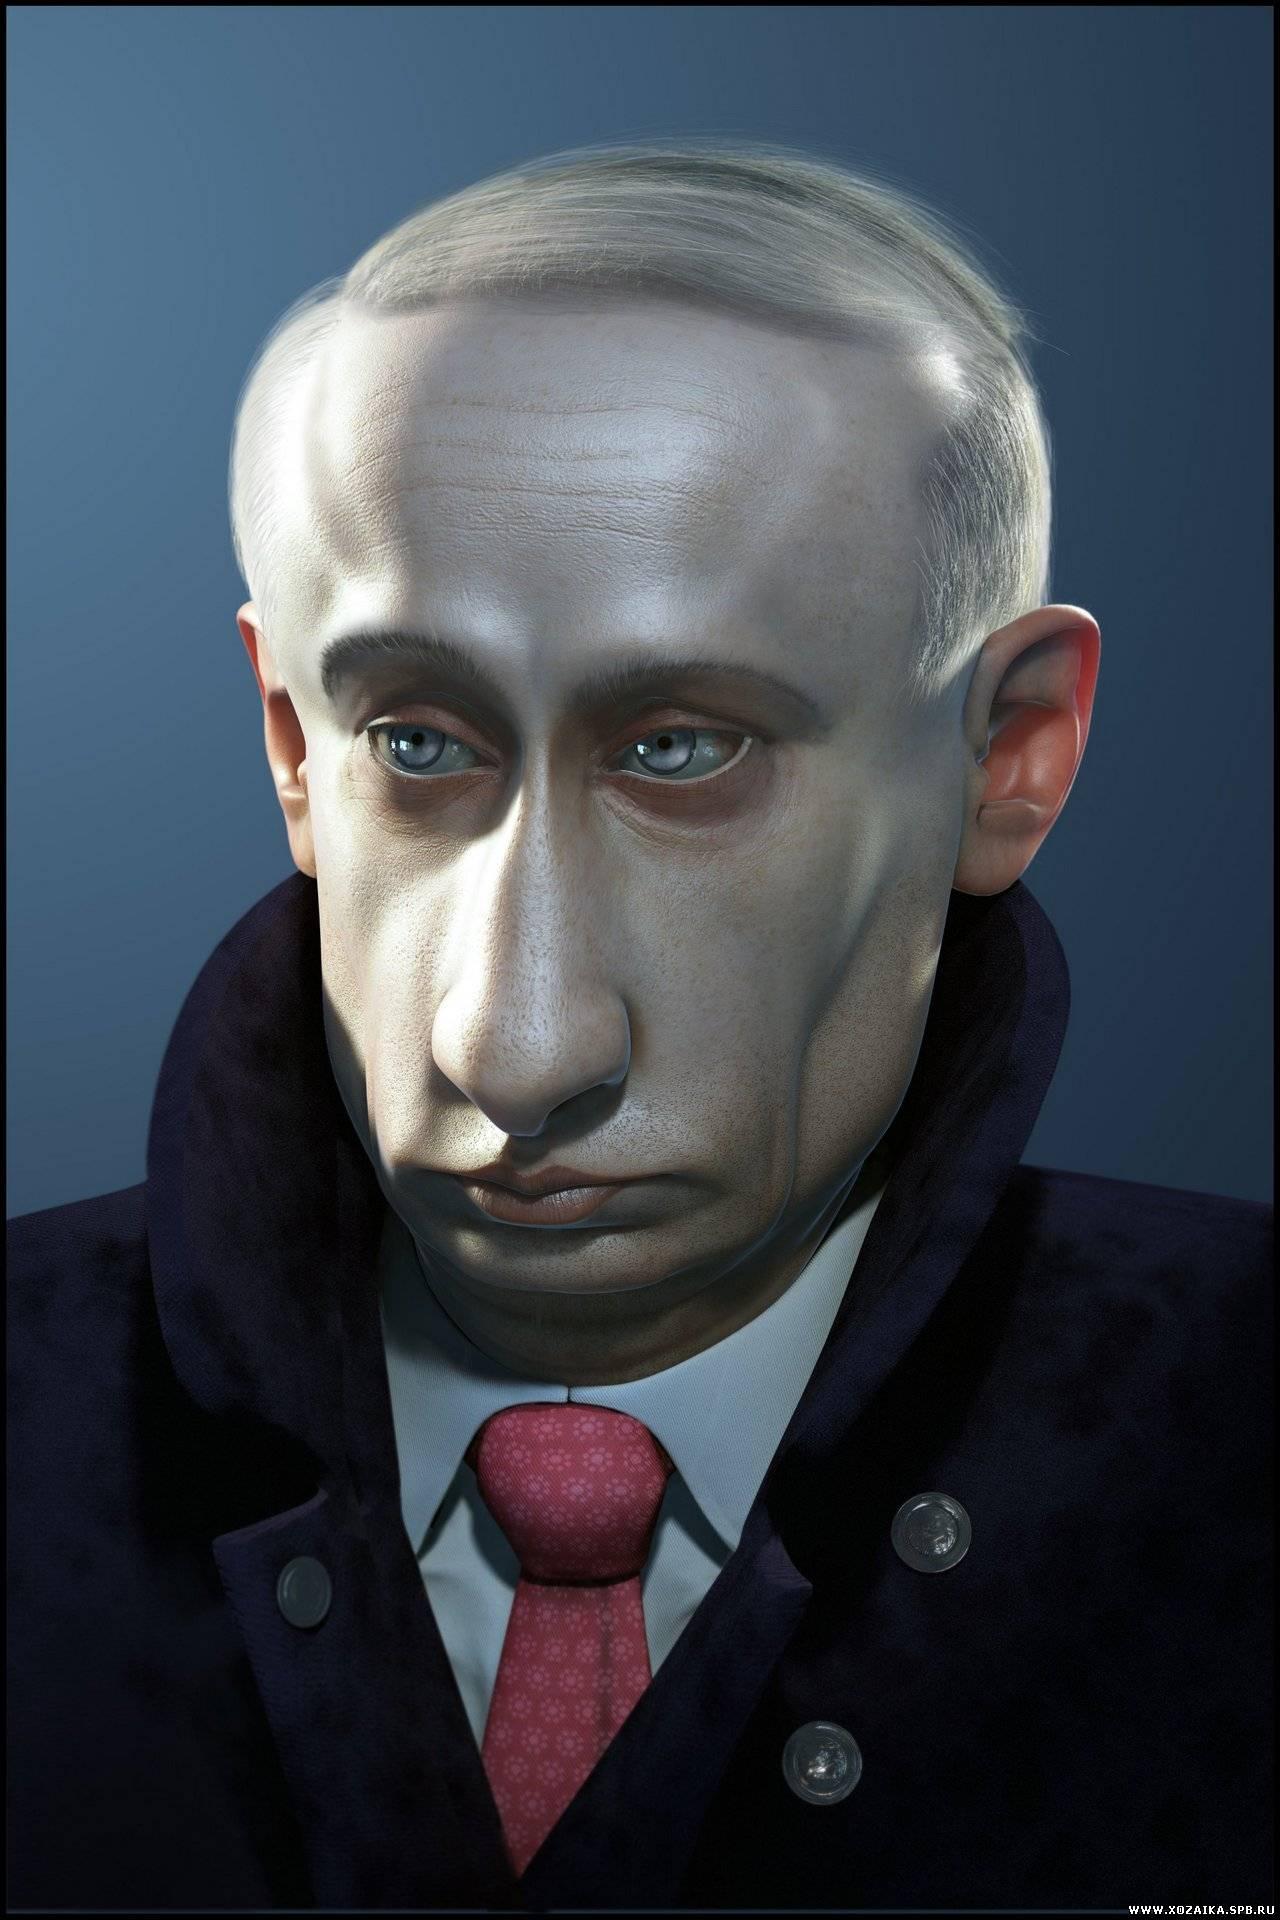 крови топ фото путин на аватарку дачу Подмосковье база